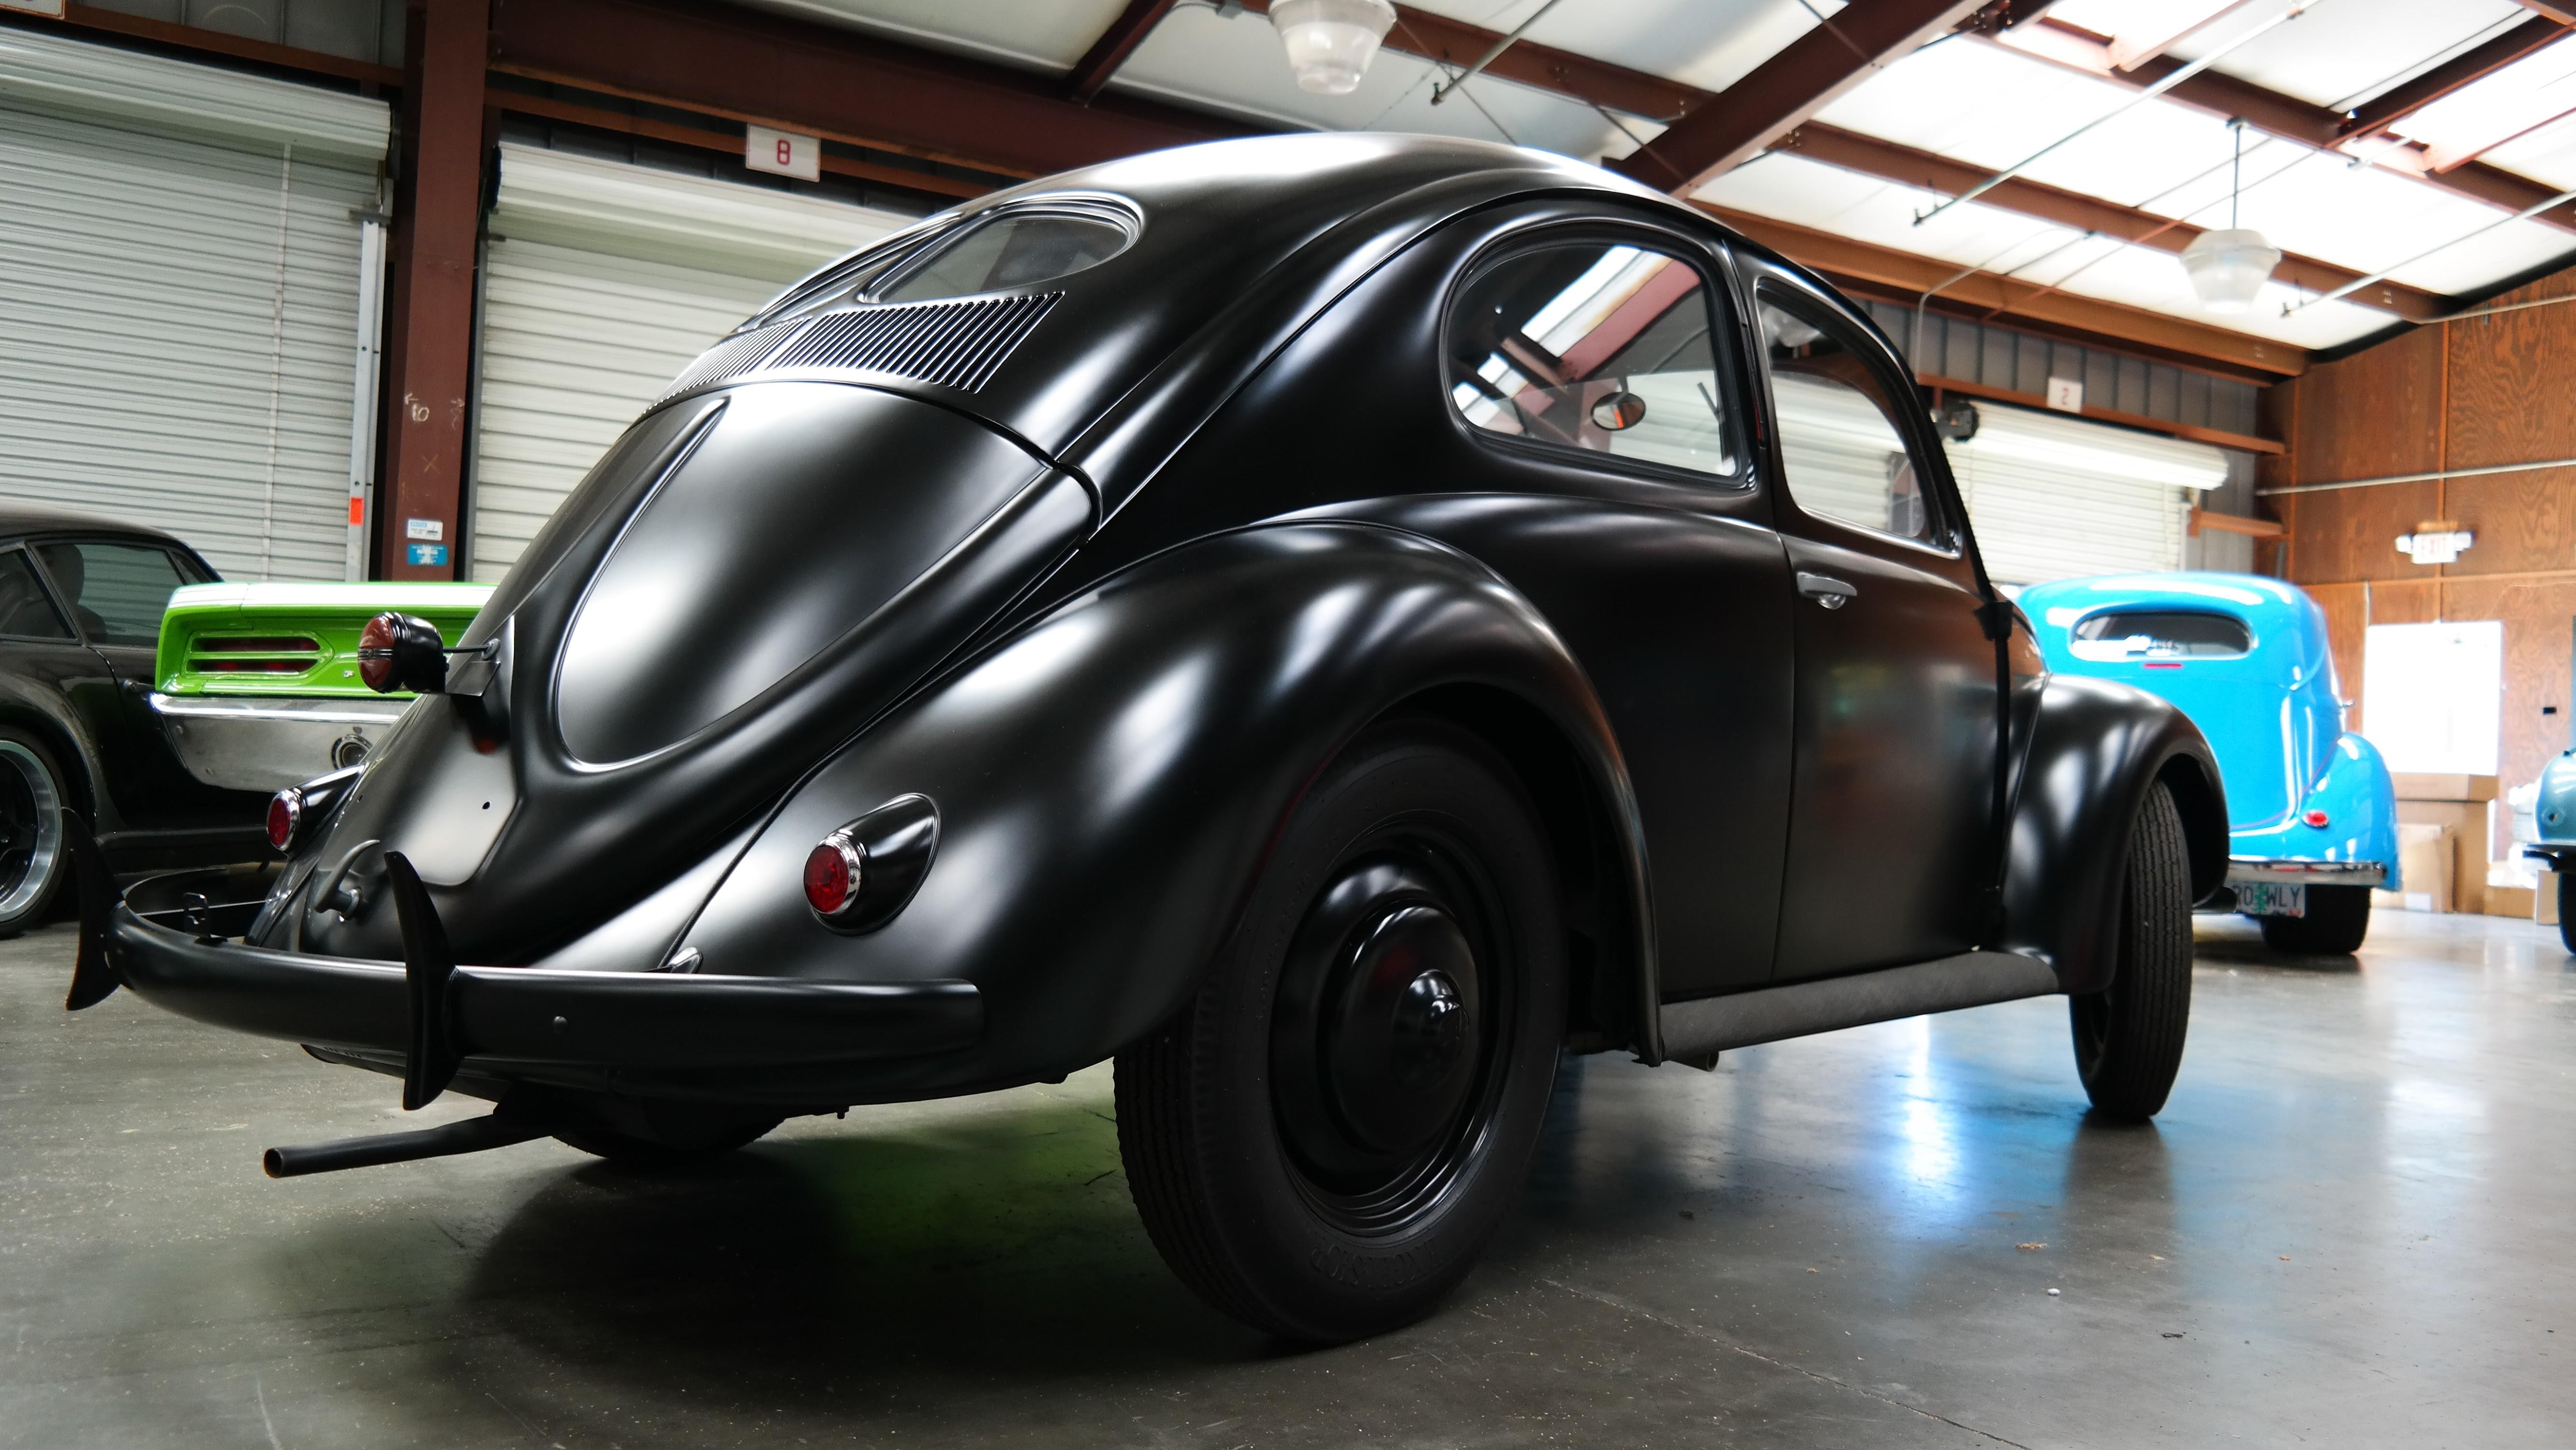 VW Beetle International Car Shipping